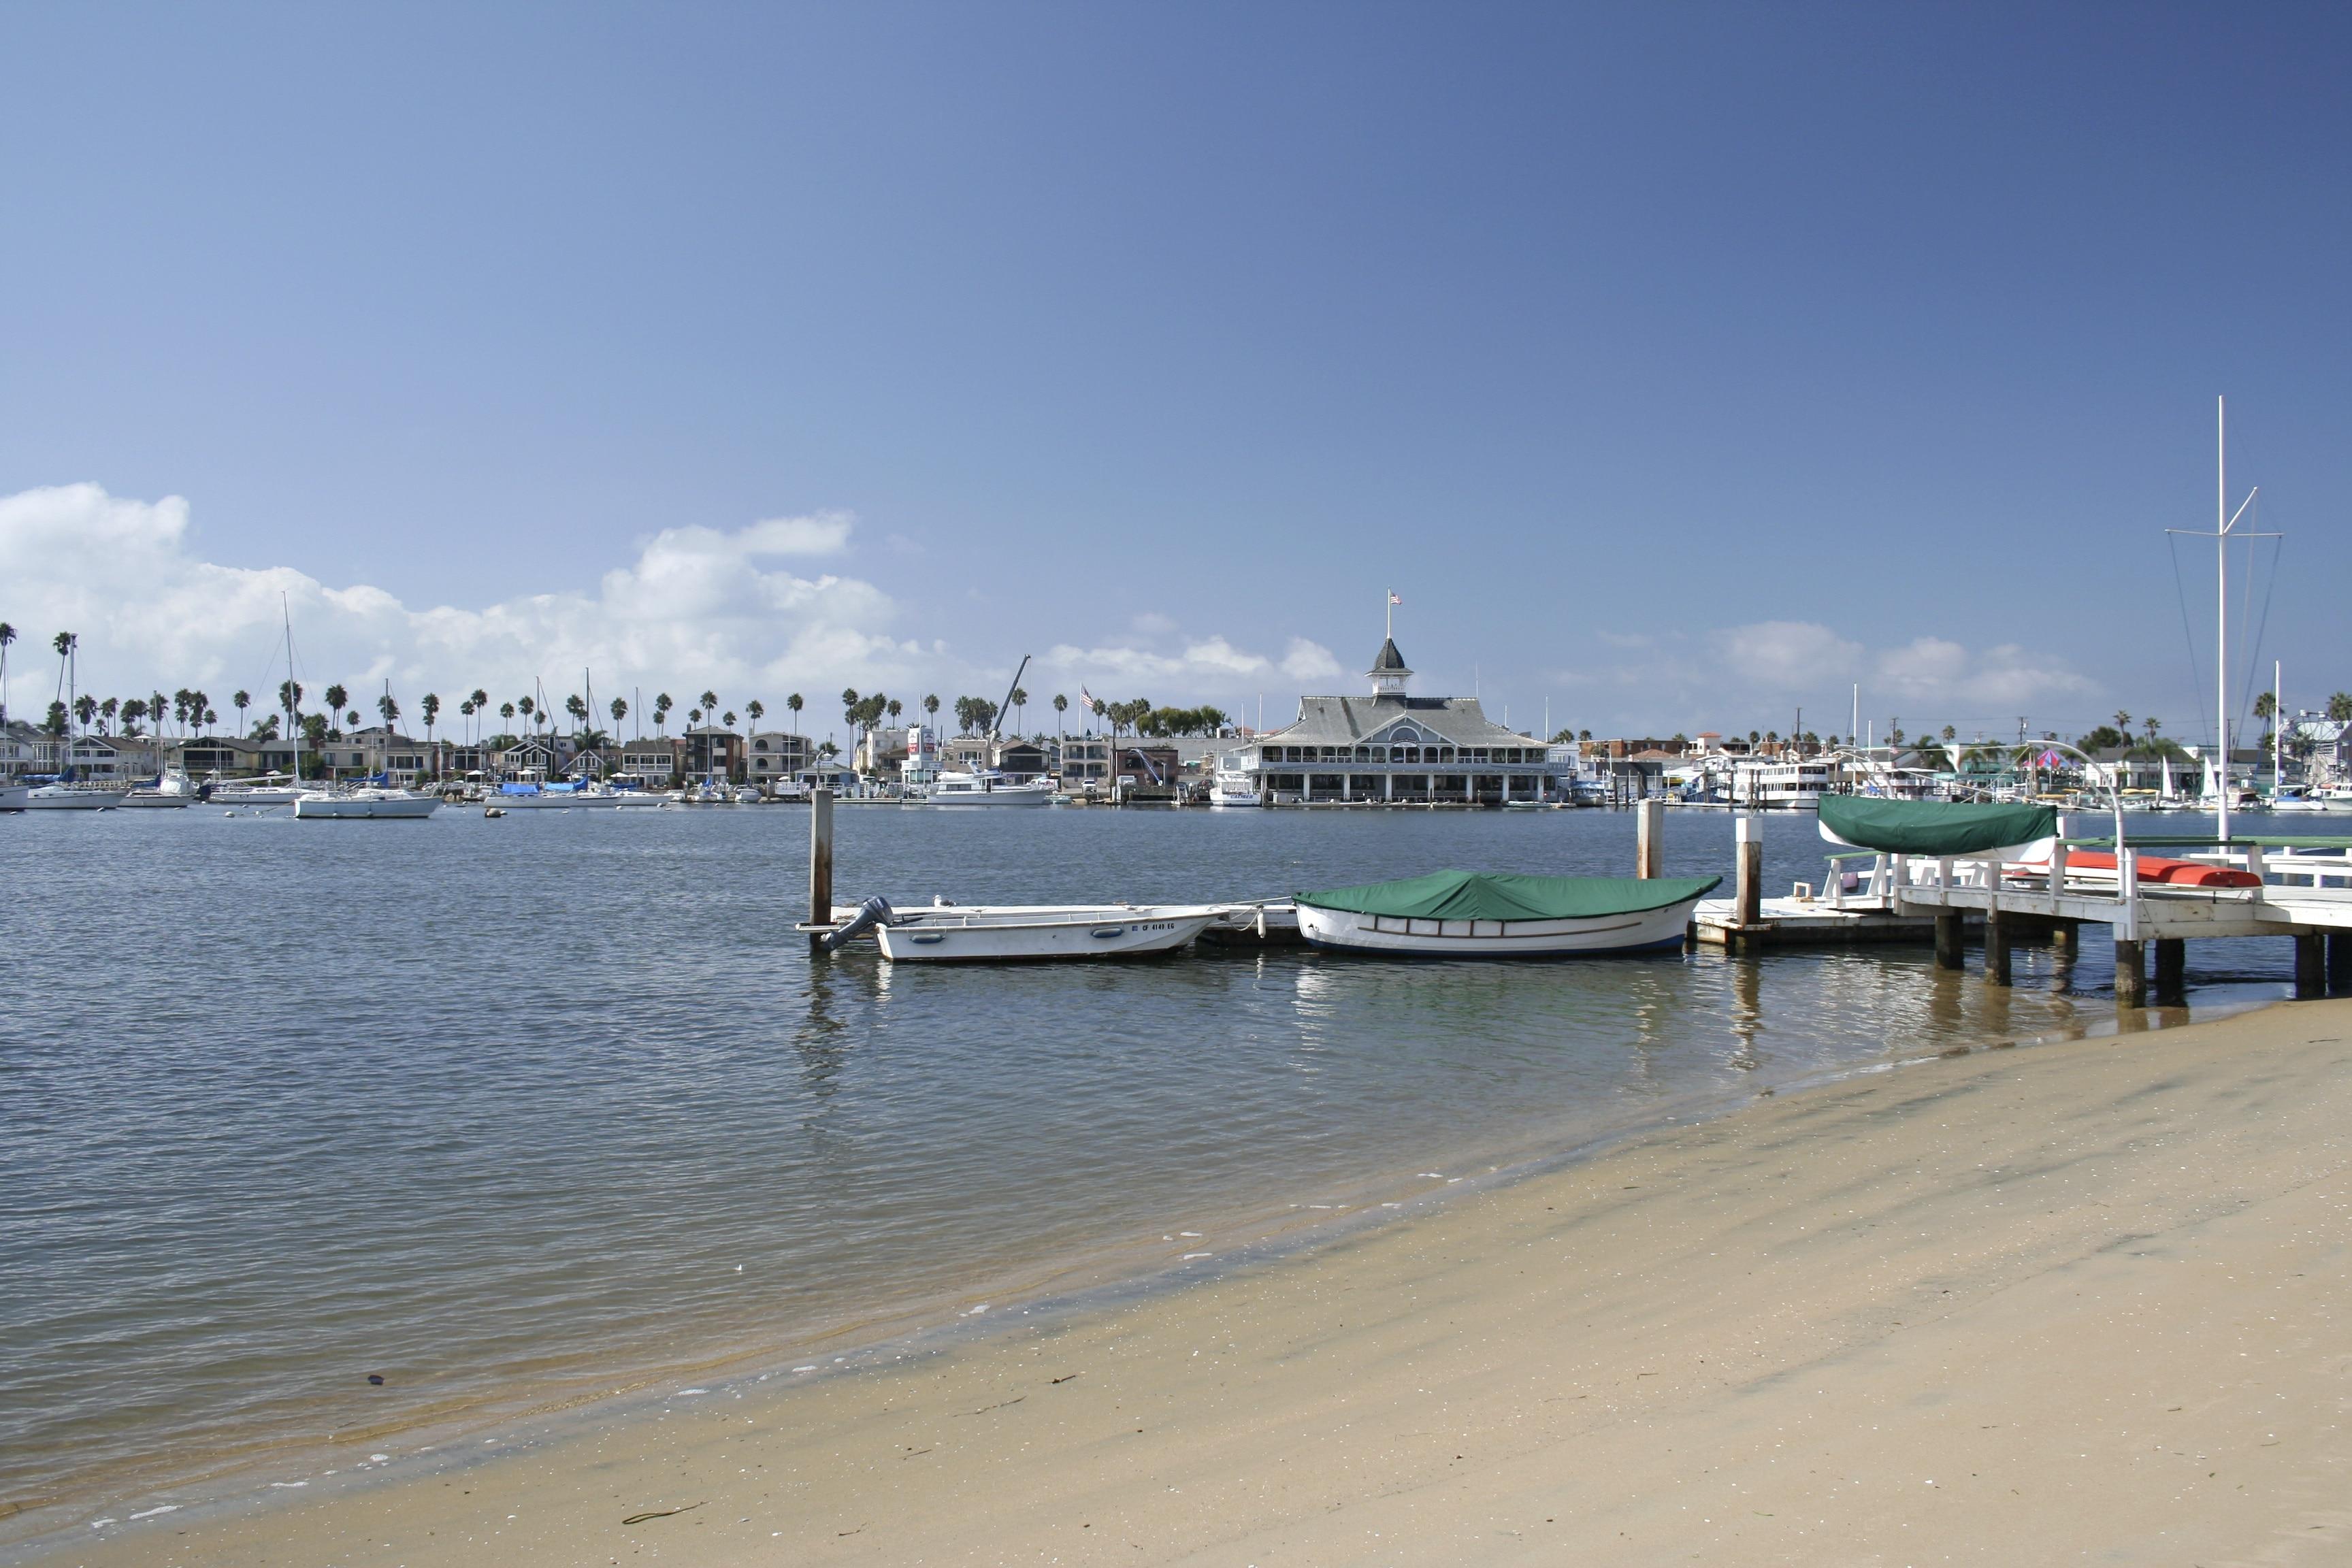 Balboa Beach, Newport Beach, California, United States of America